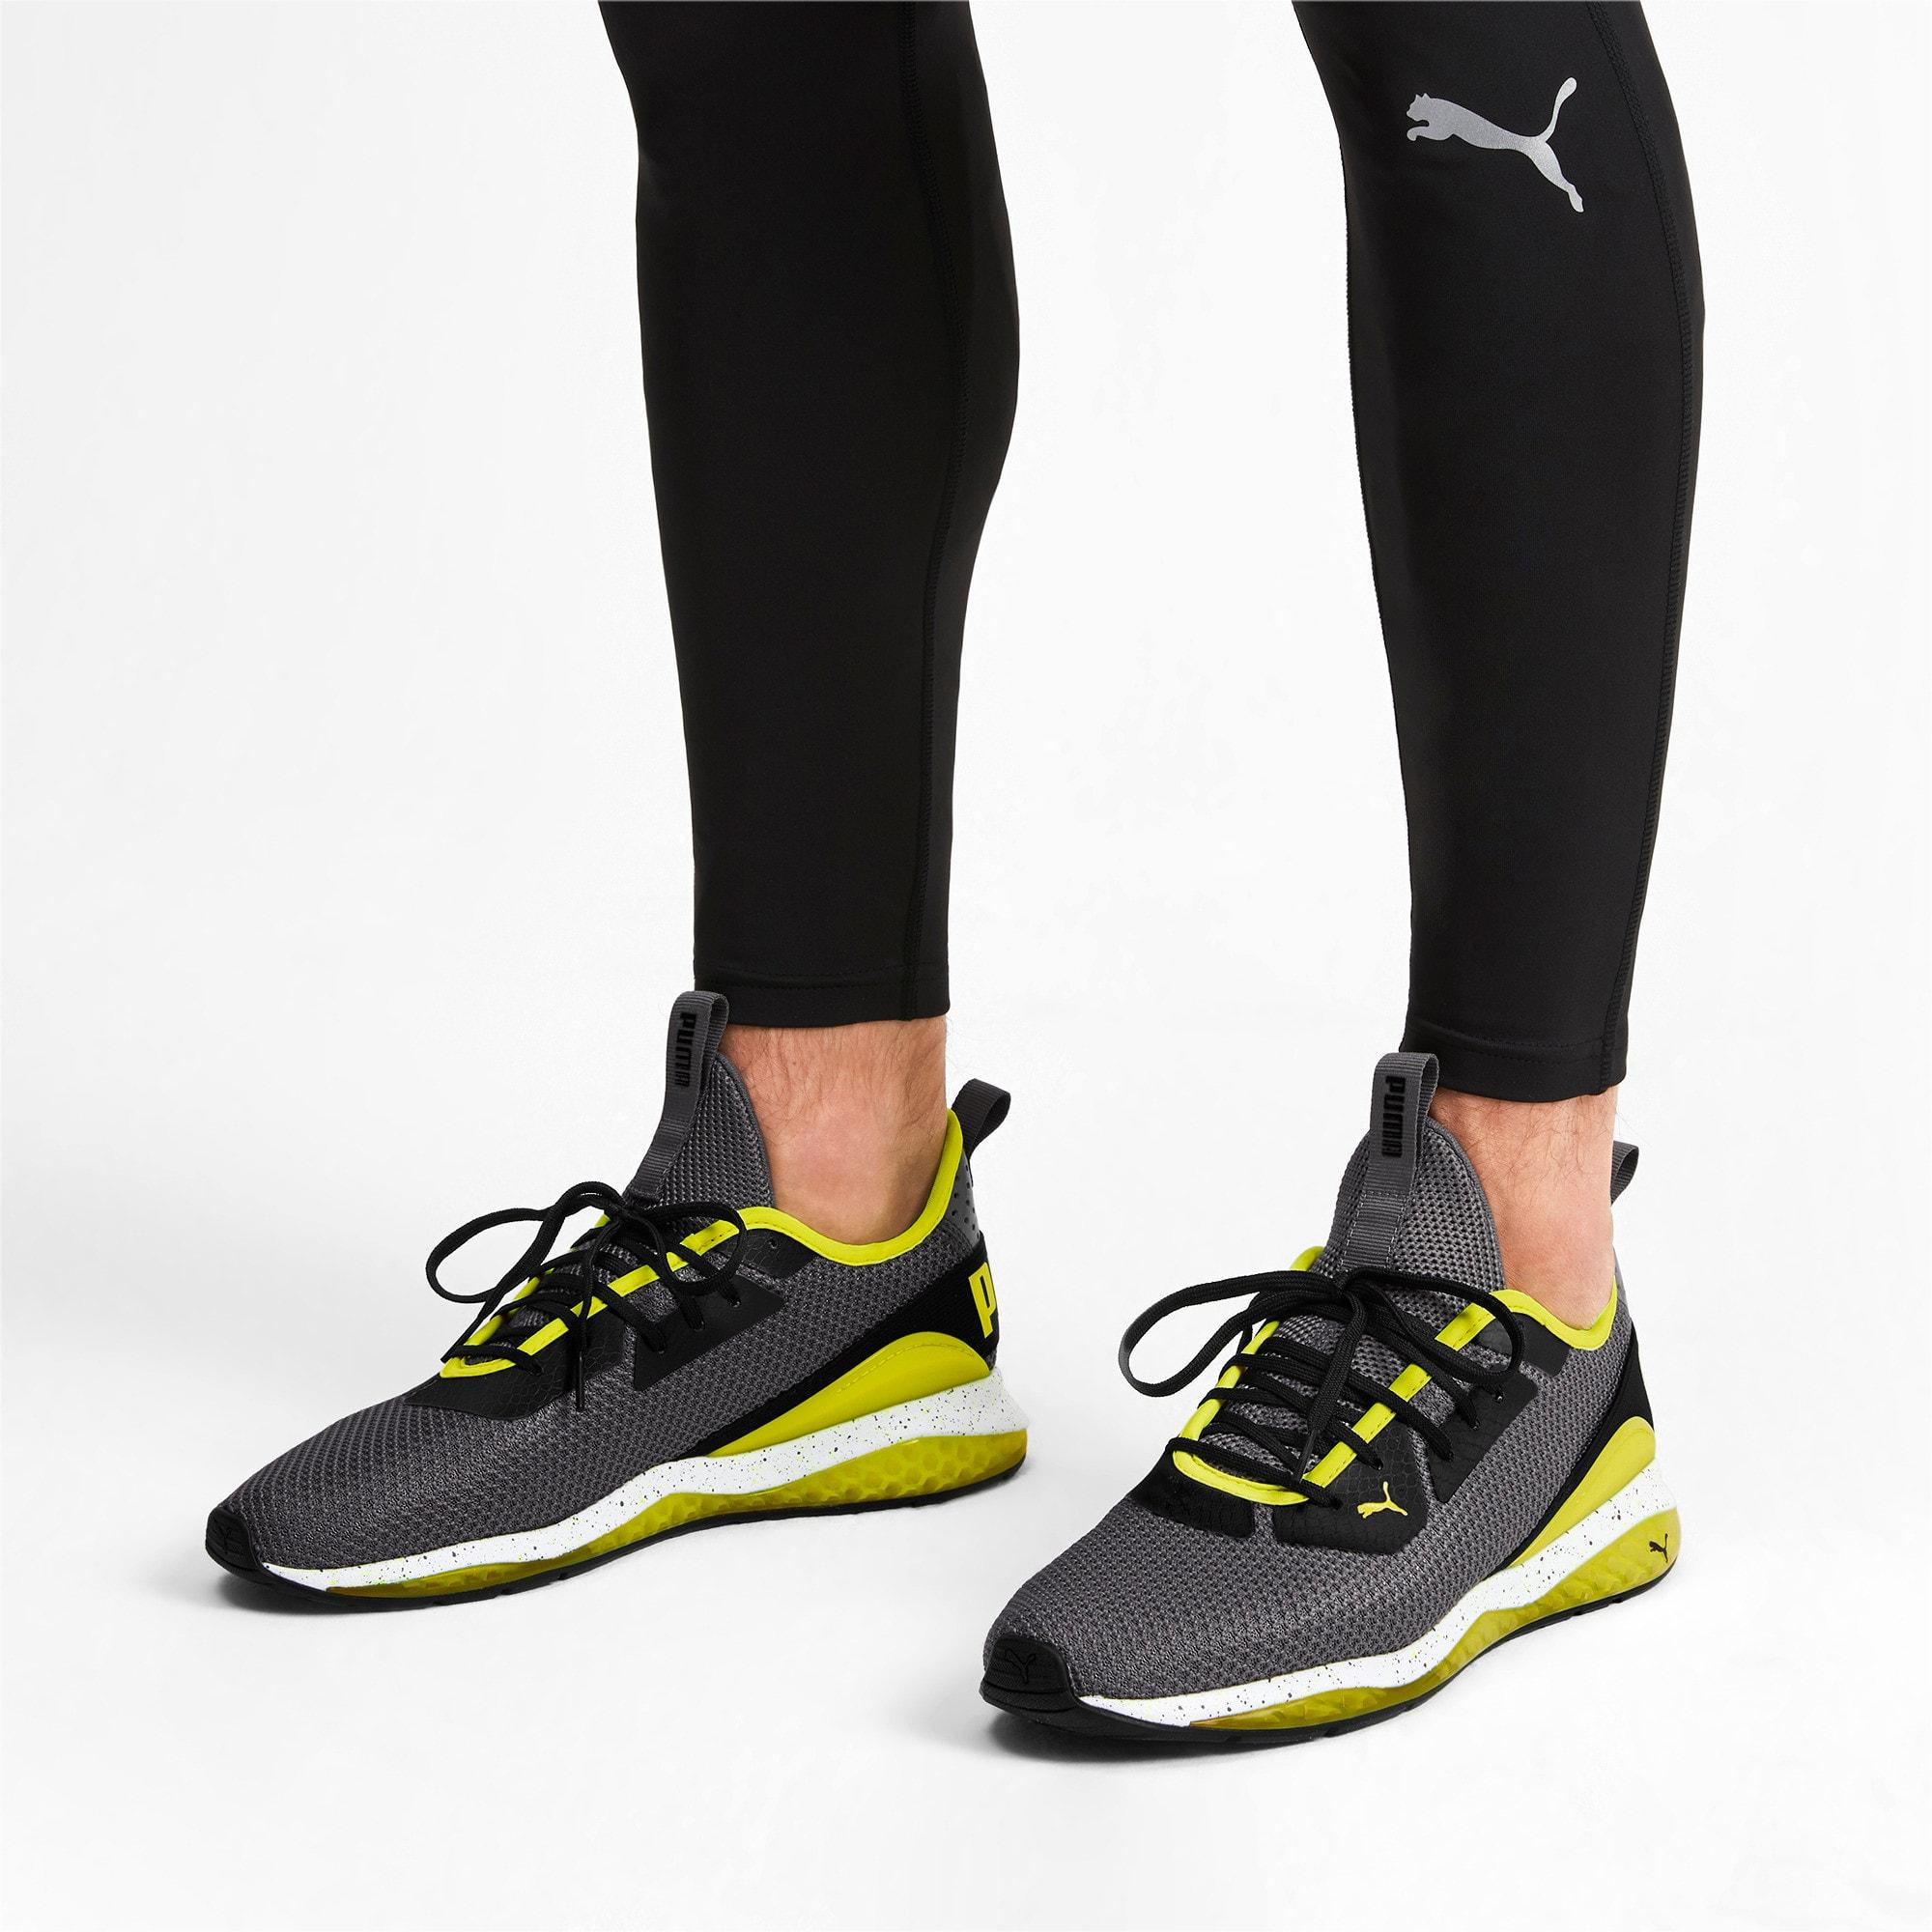 Thumbnail 3 of CELL Descend Weave Men's Training Shoes, CASTLEROCK-Black-Yellow, medium